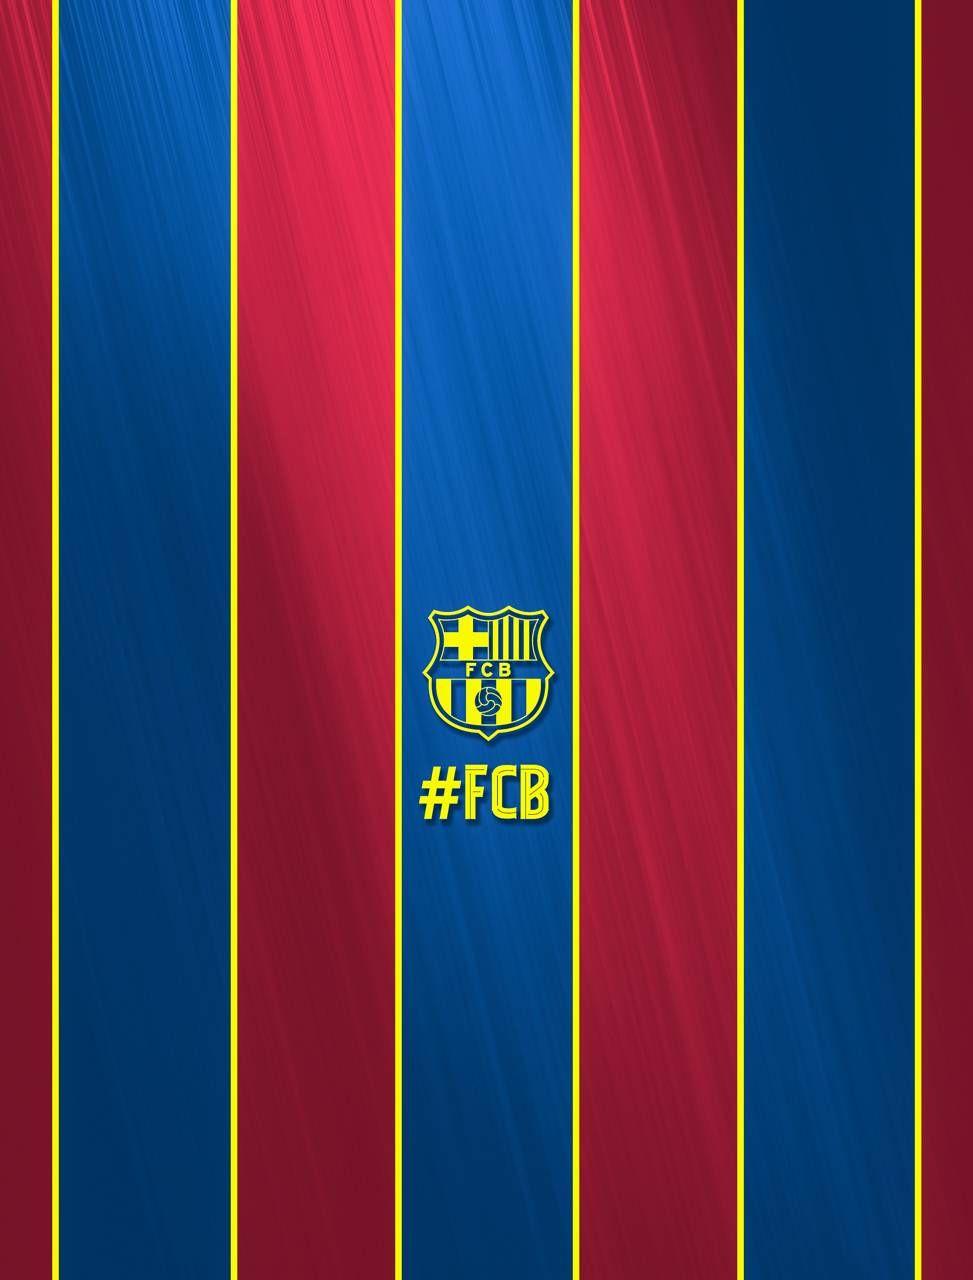 Barcelona 2021 Wallpapers   Top Barcelona 2021 Backgrounds 973x1280